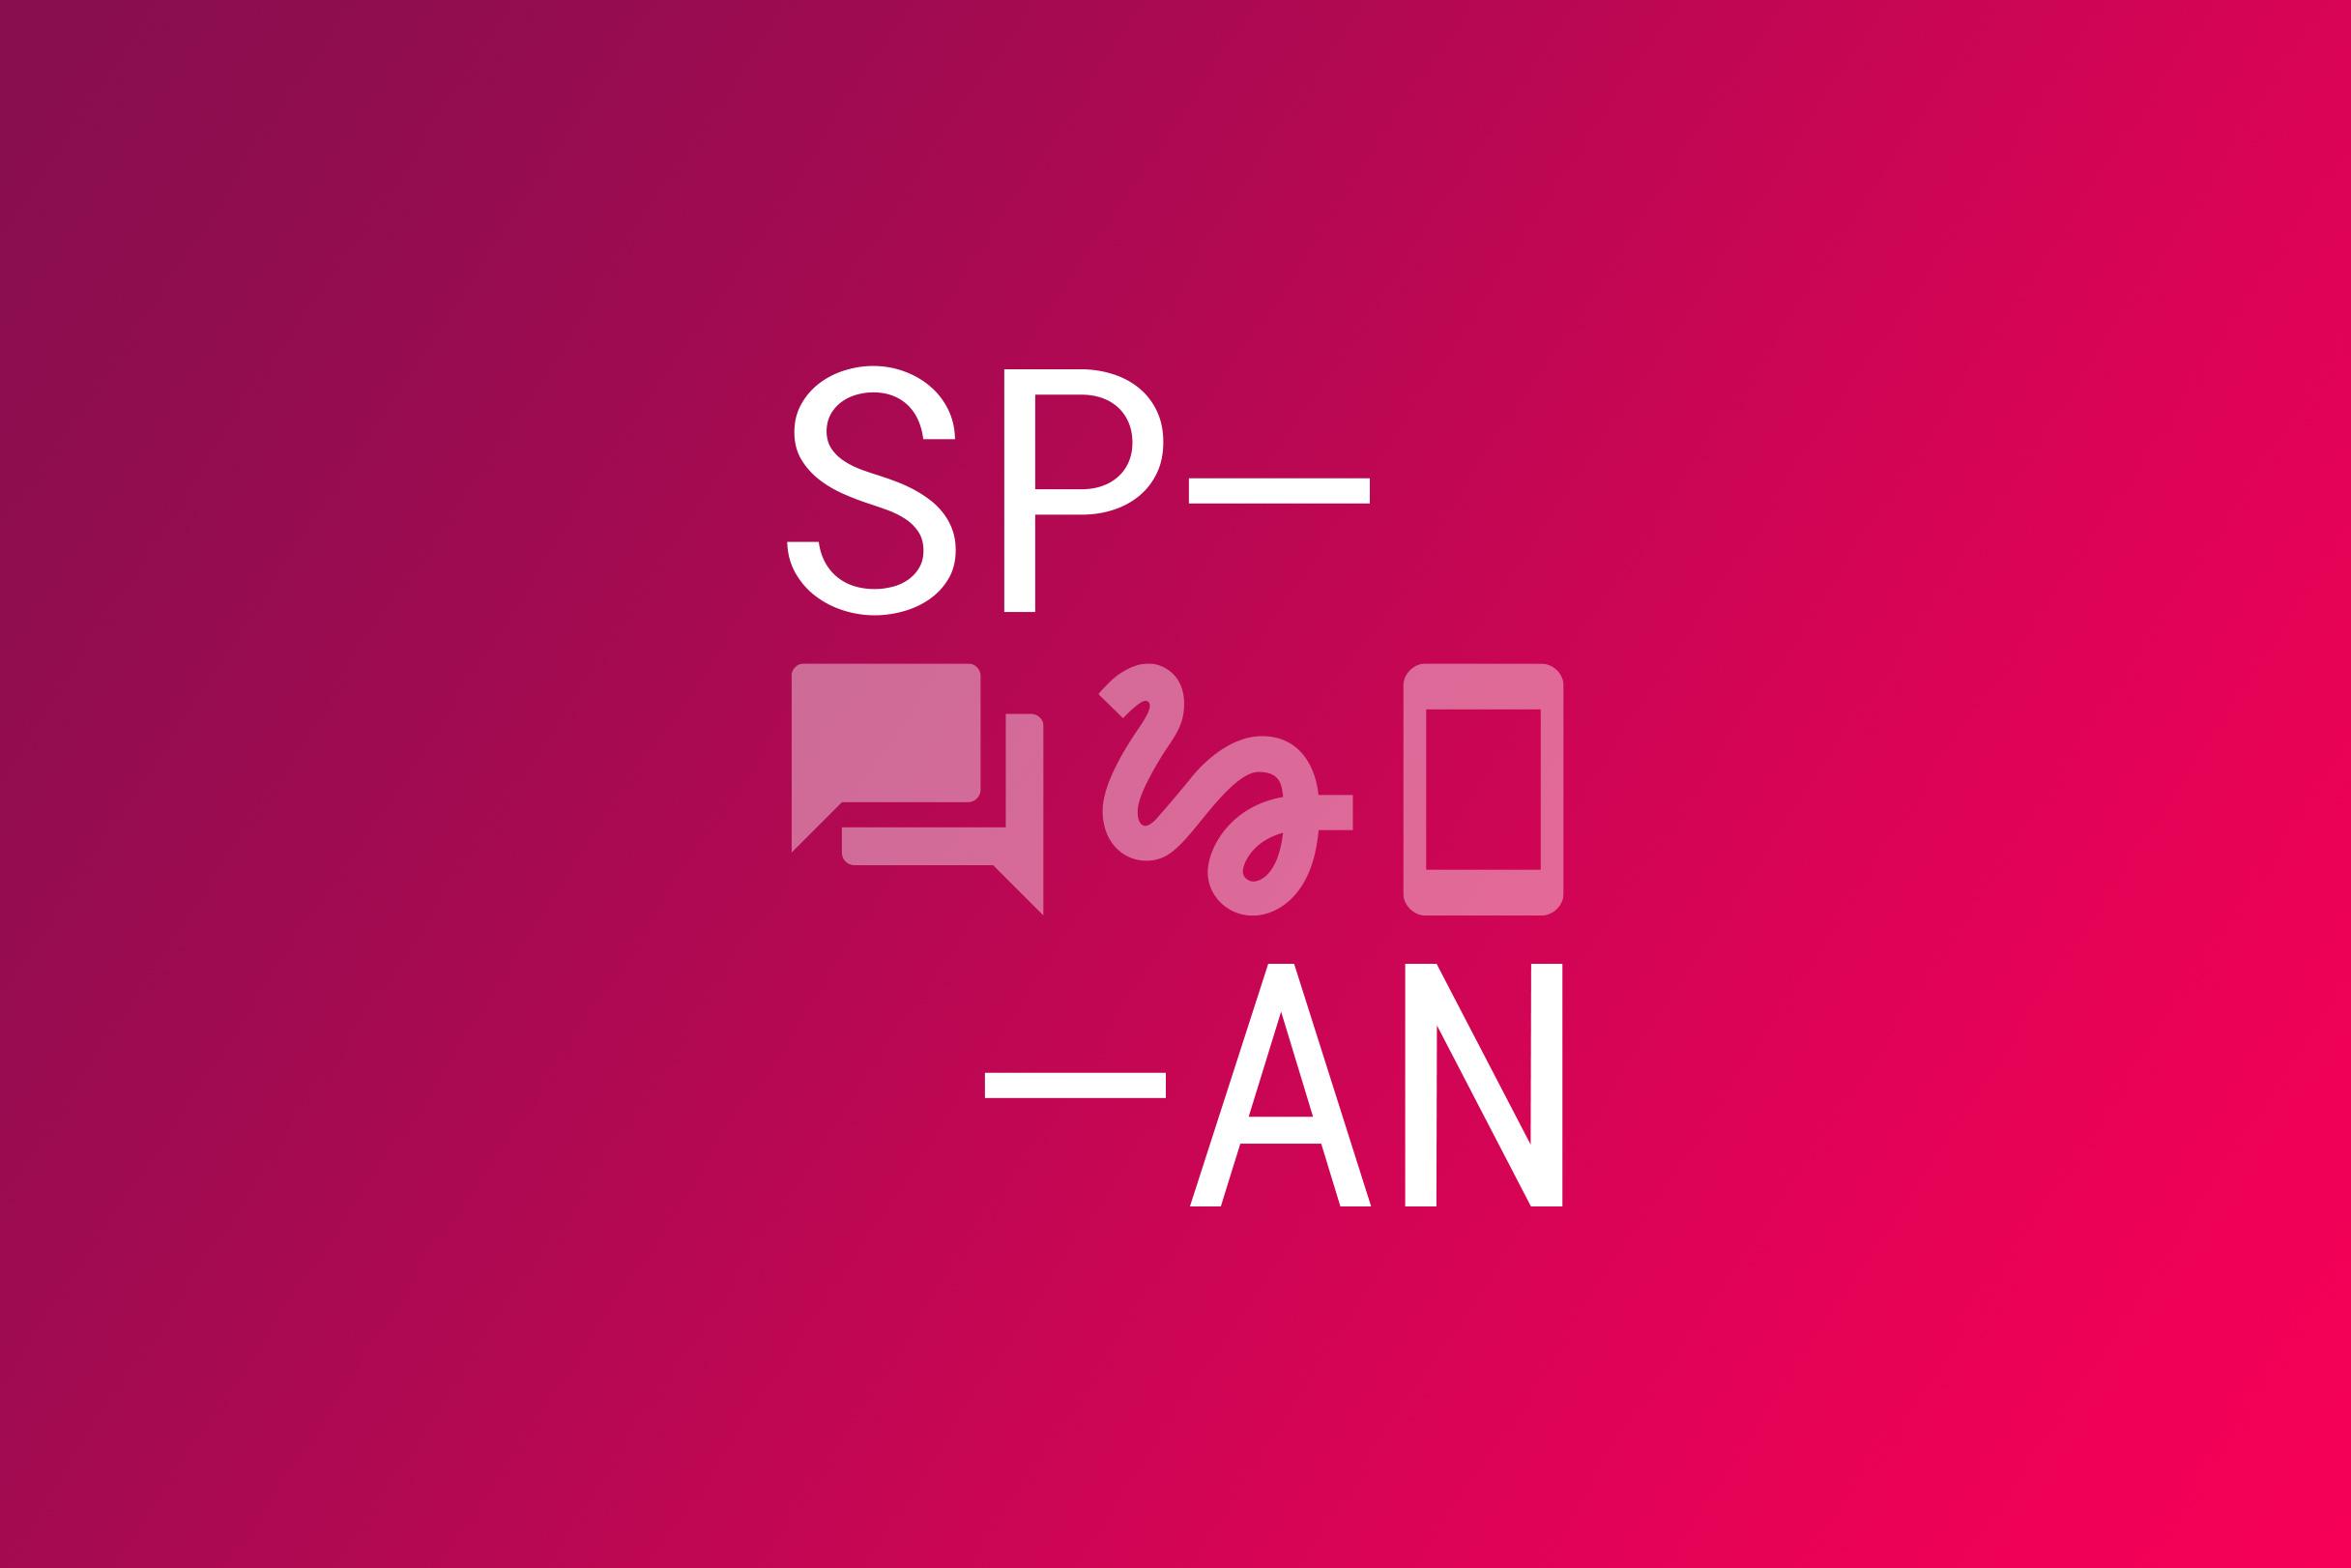 span_nyc_3x2.jpg